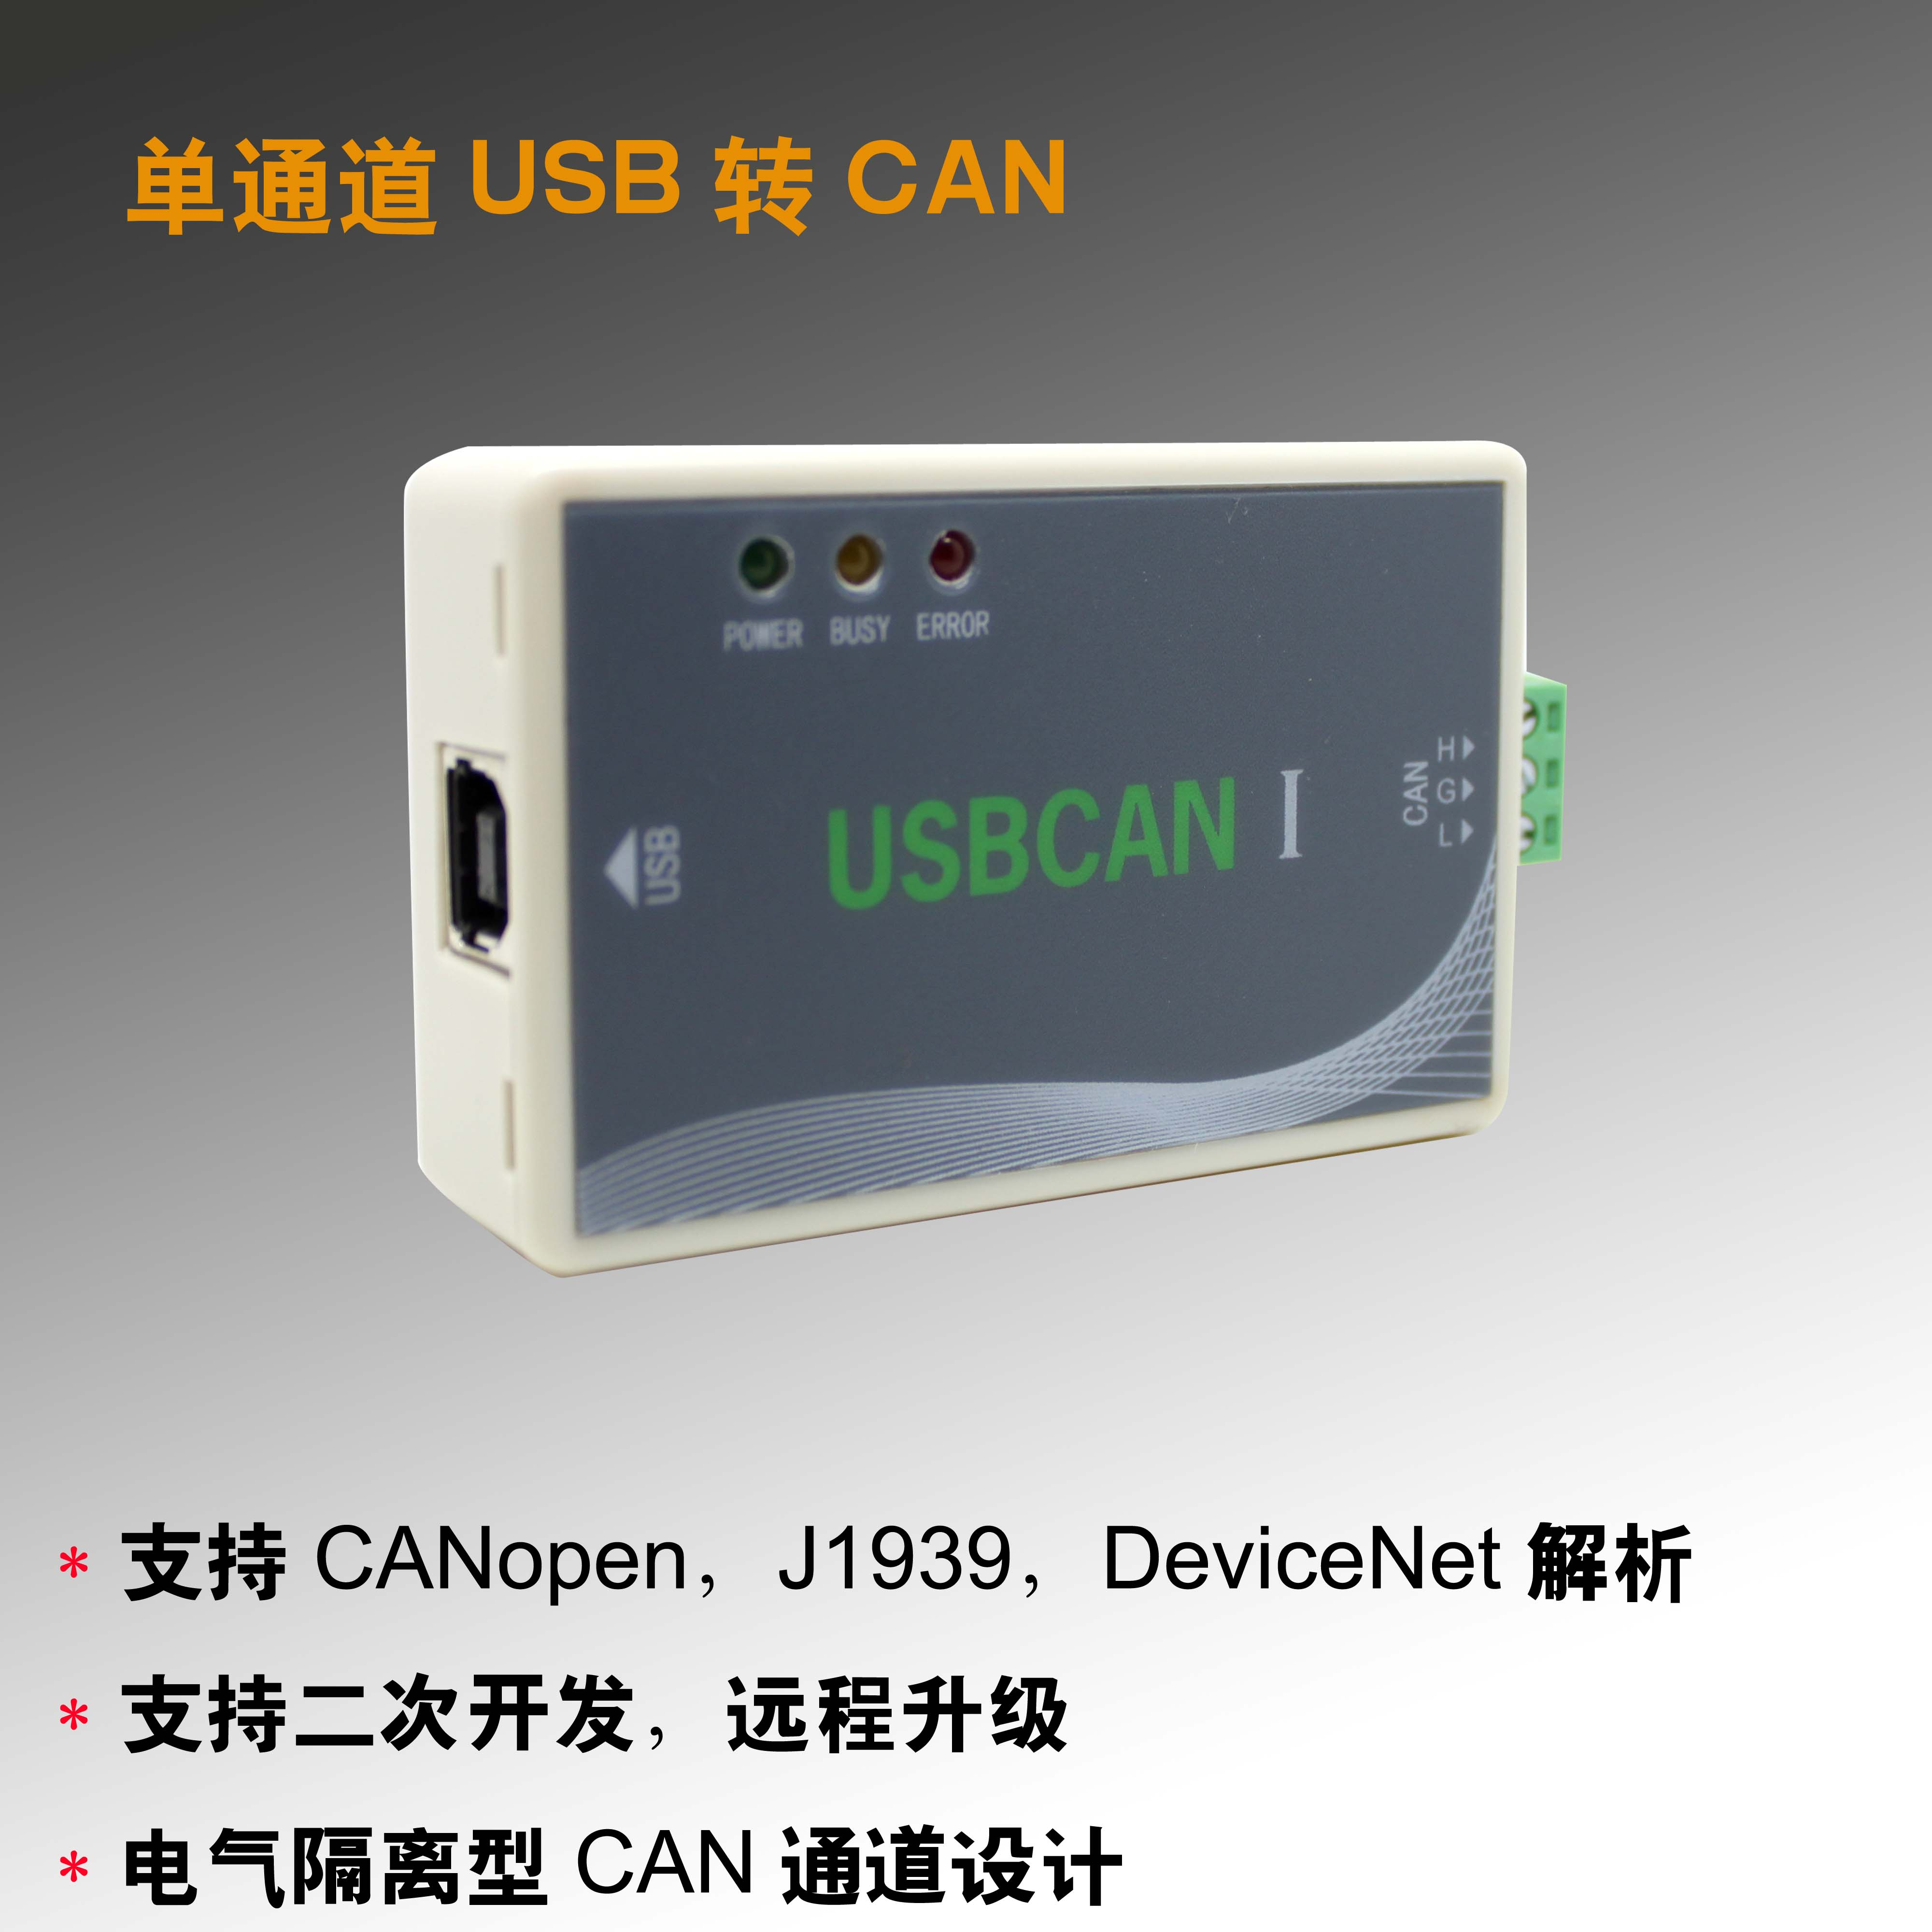 купить The USB CAN USBCAN Debugger Supports Two Development по цене 3662.55 рублей